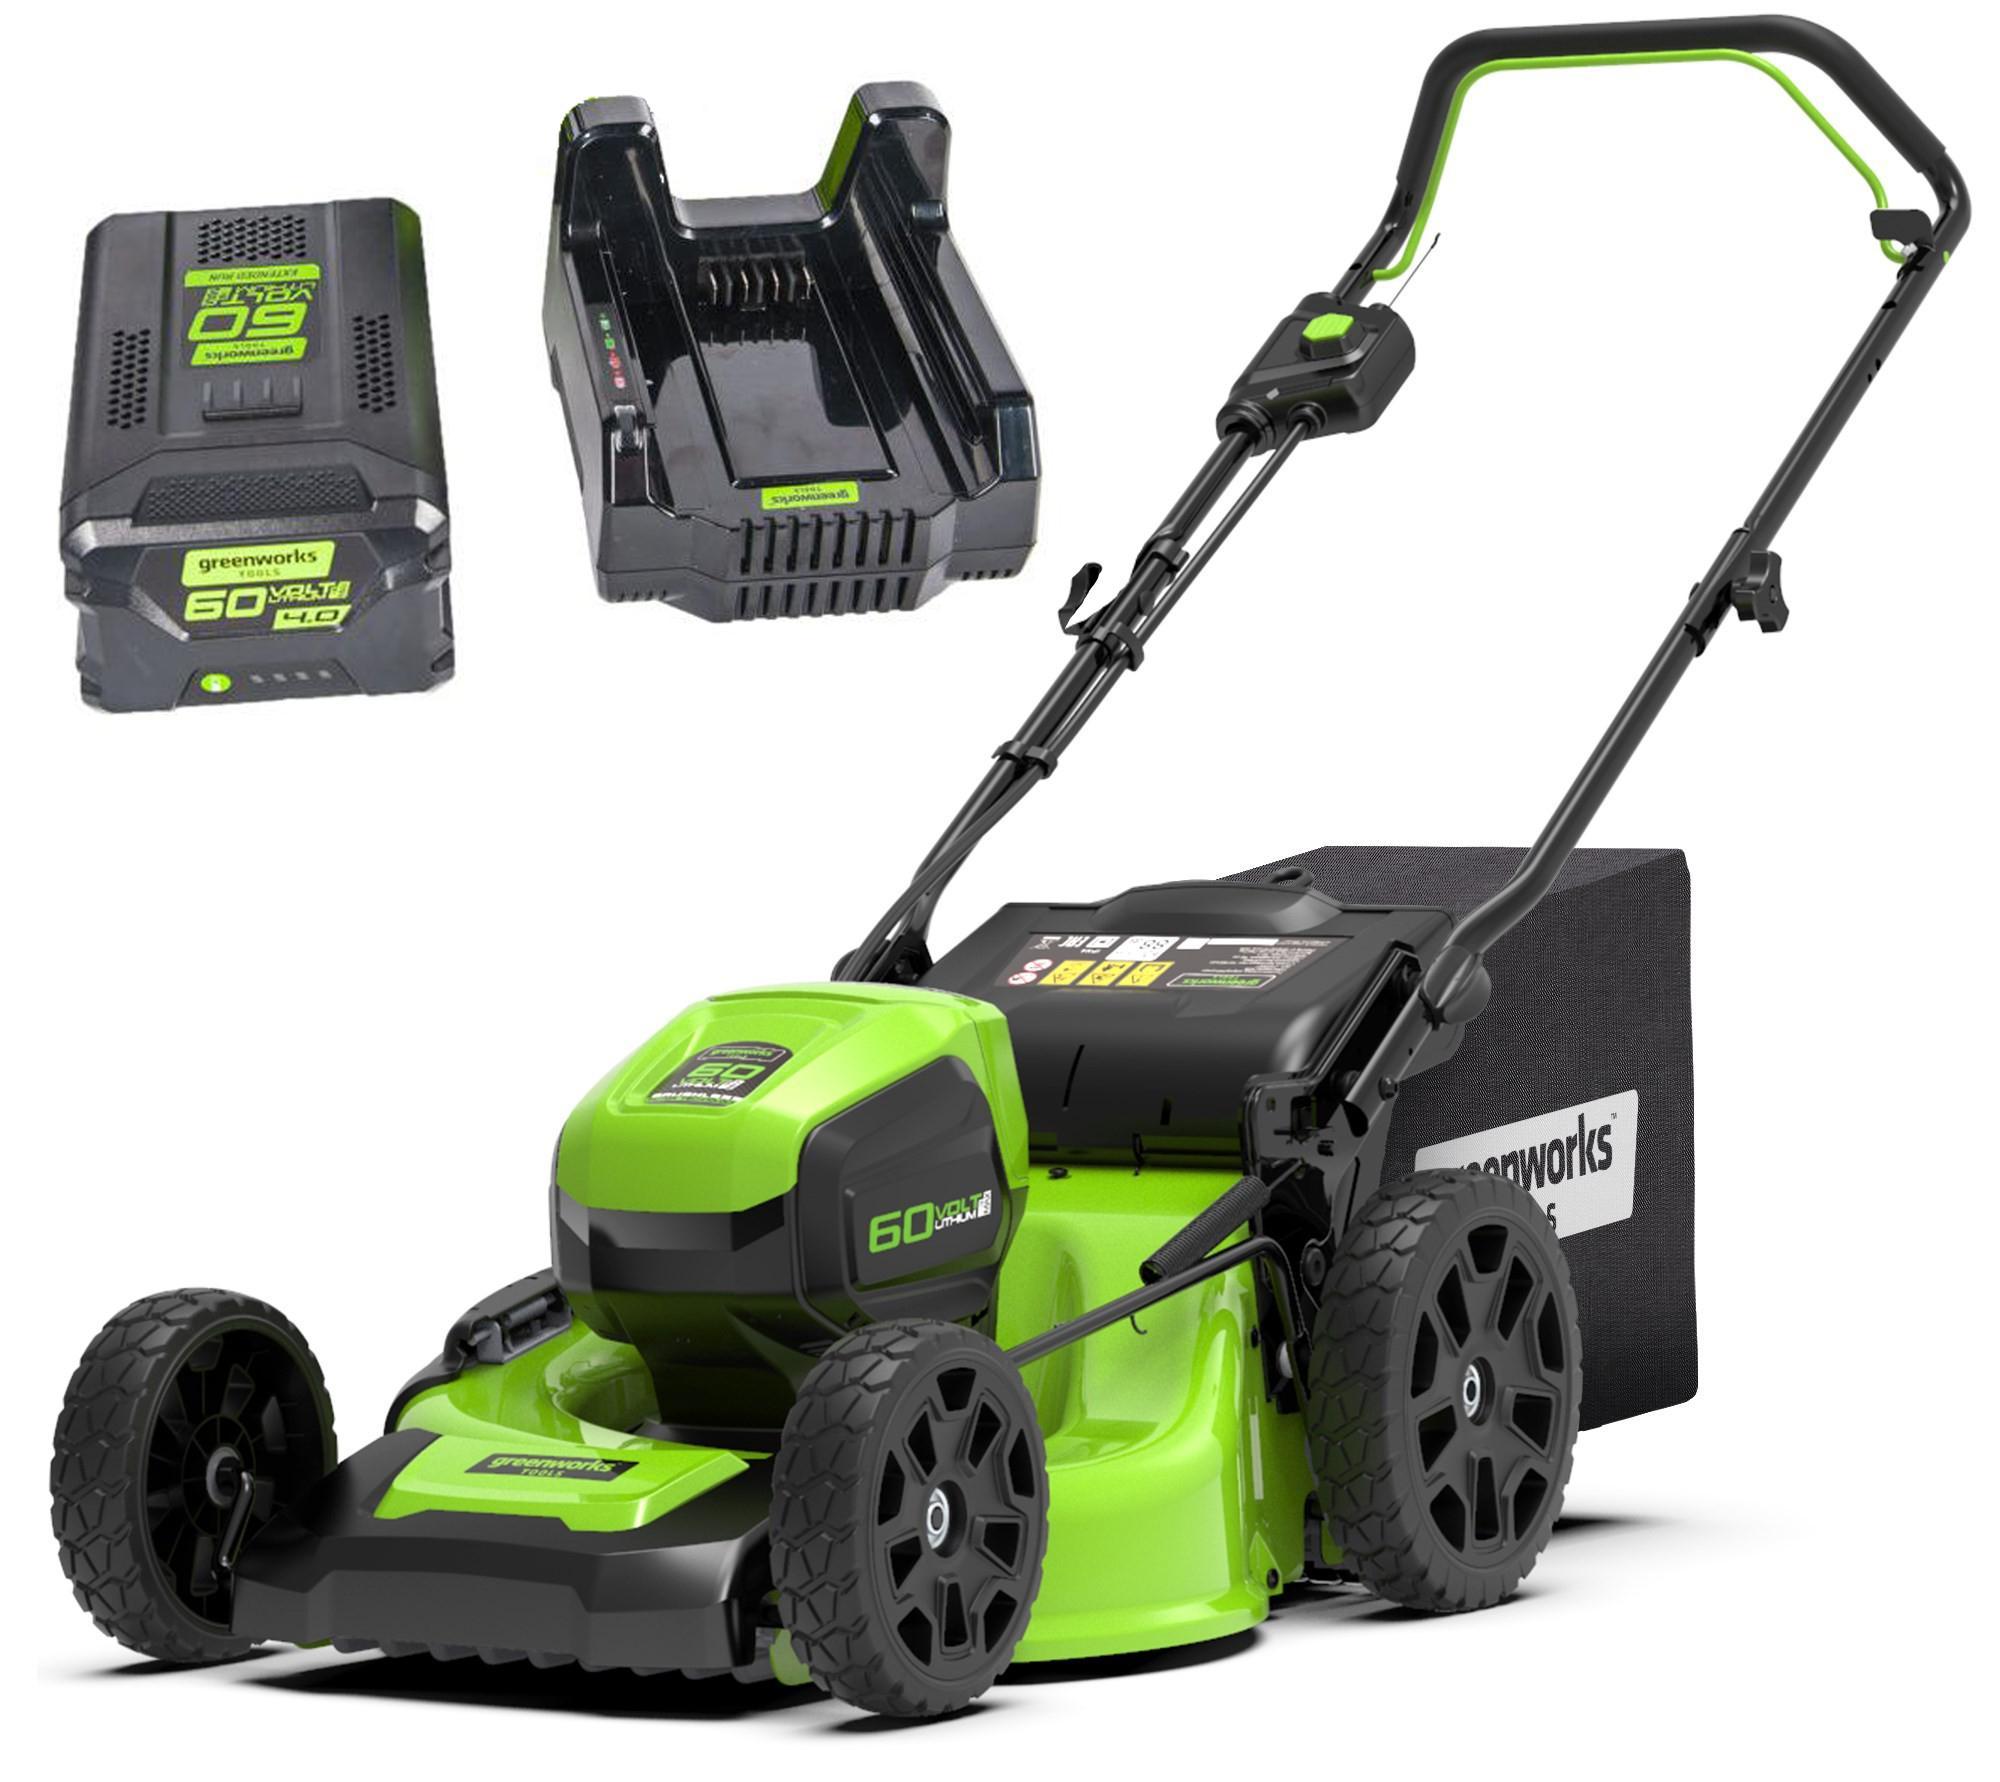 Аккумуляторная газонокосилка Greenworks Gd60lm51hpk4 (2502707ub)